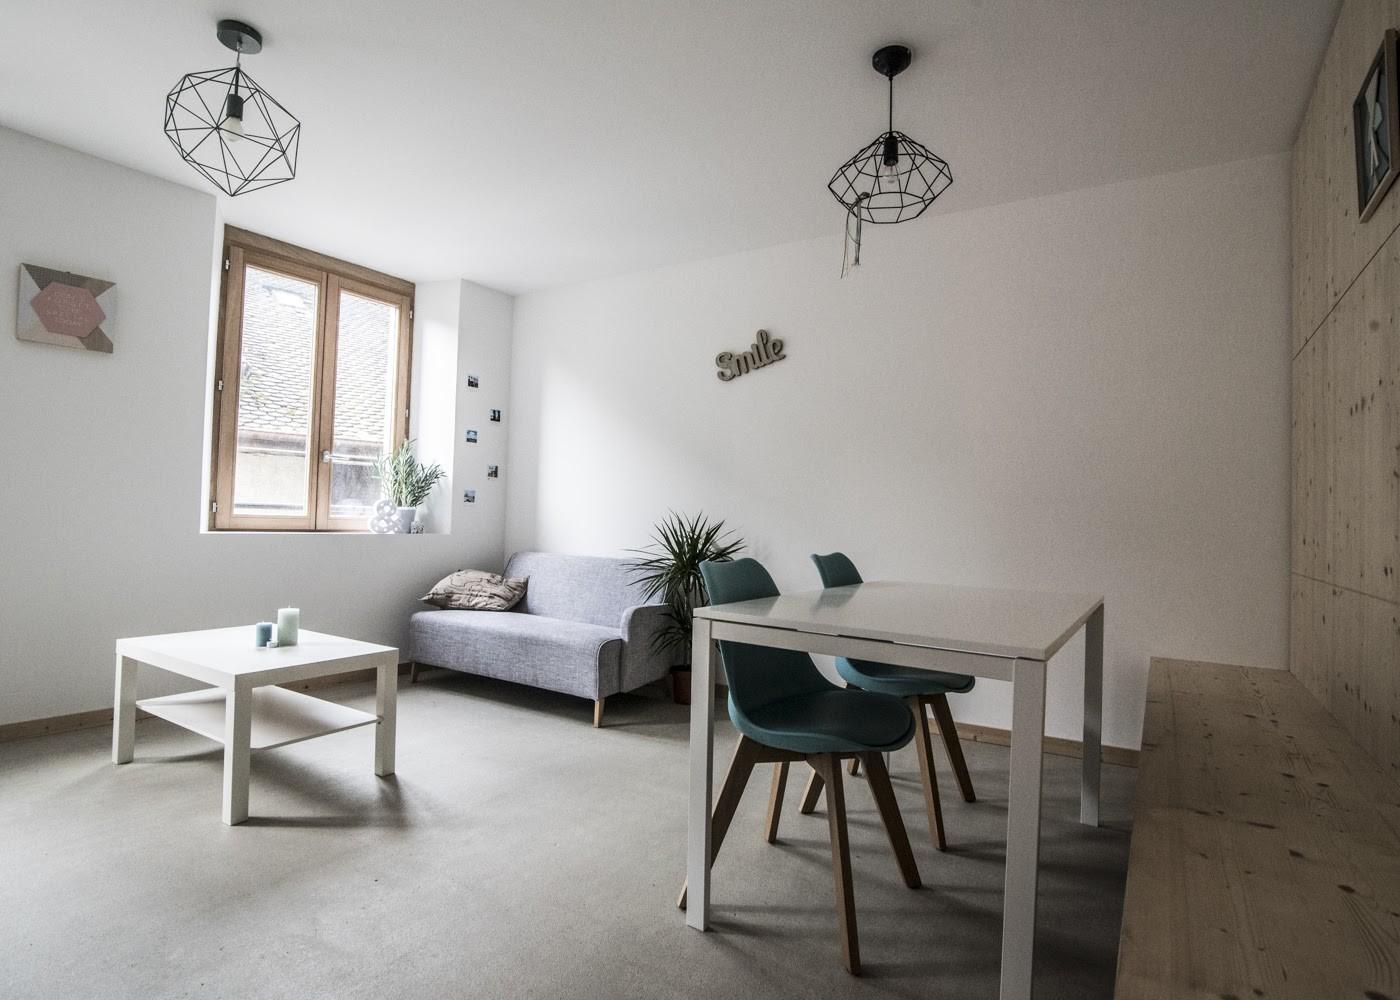 Colocation 360 Euros Meuble Et Deco Sympa Location Chambres Lyon